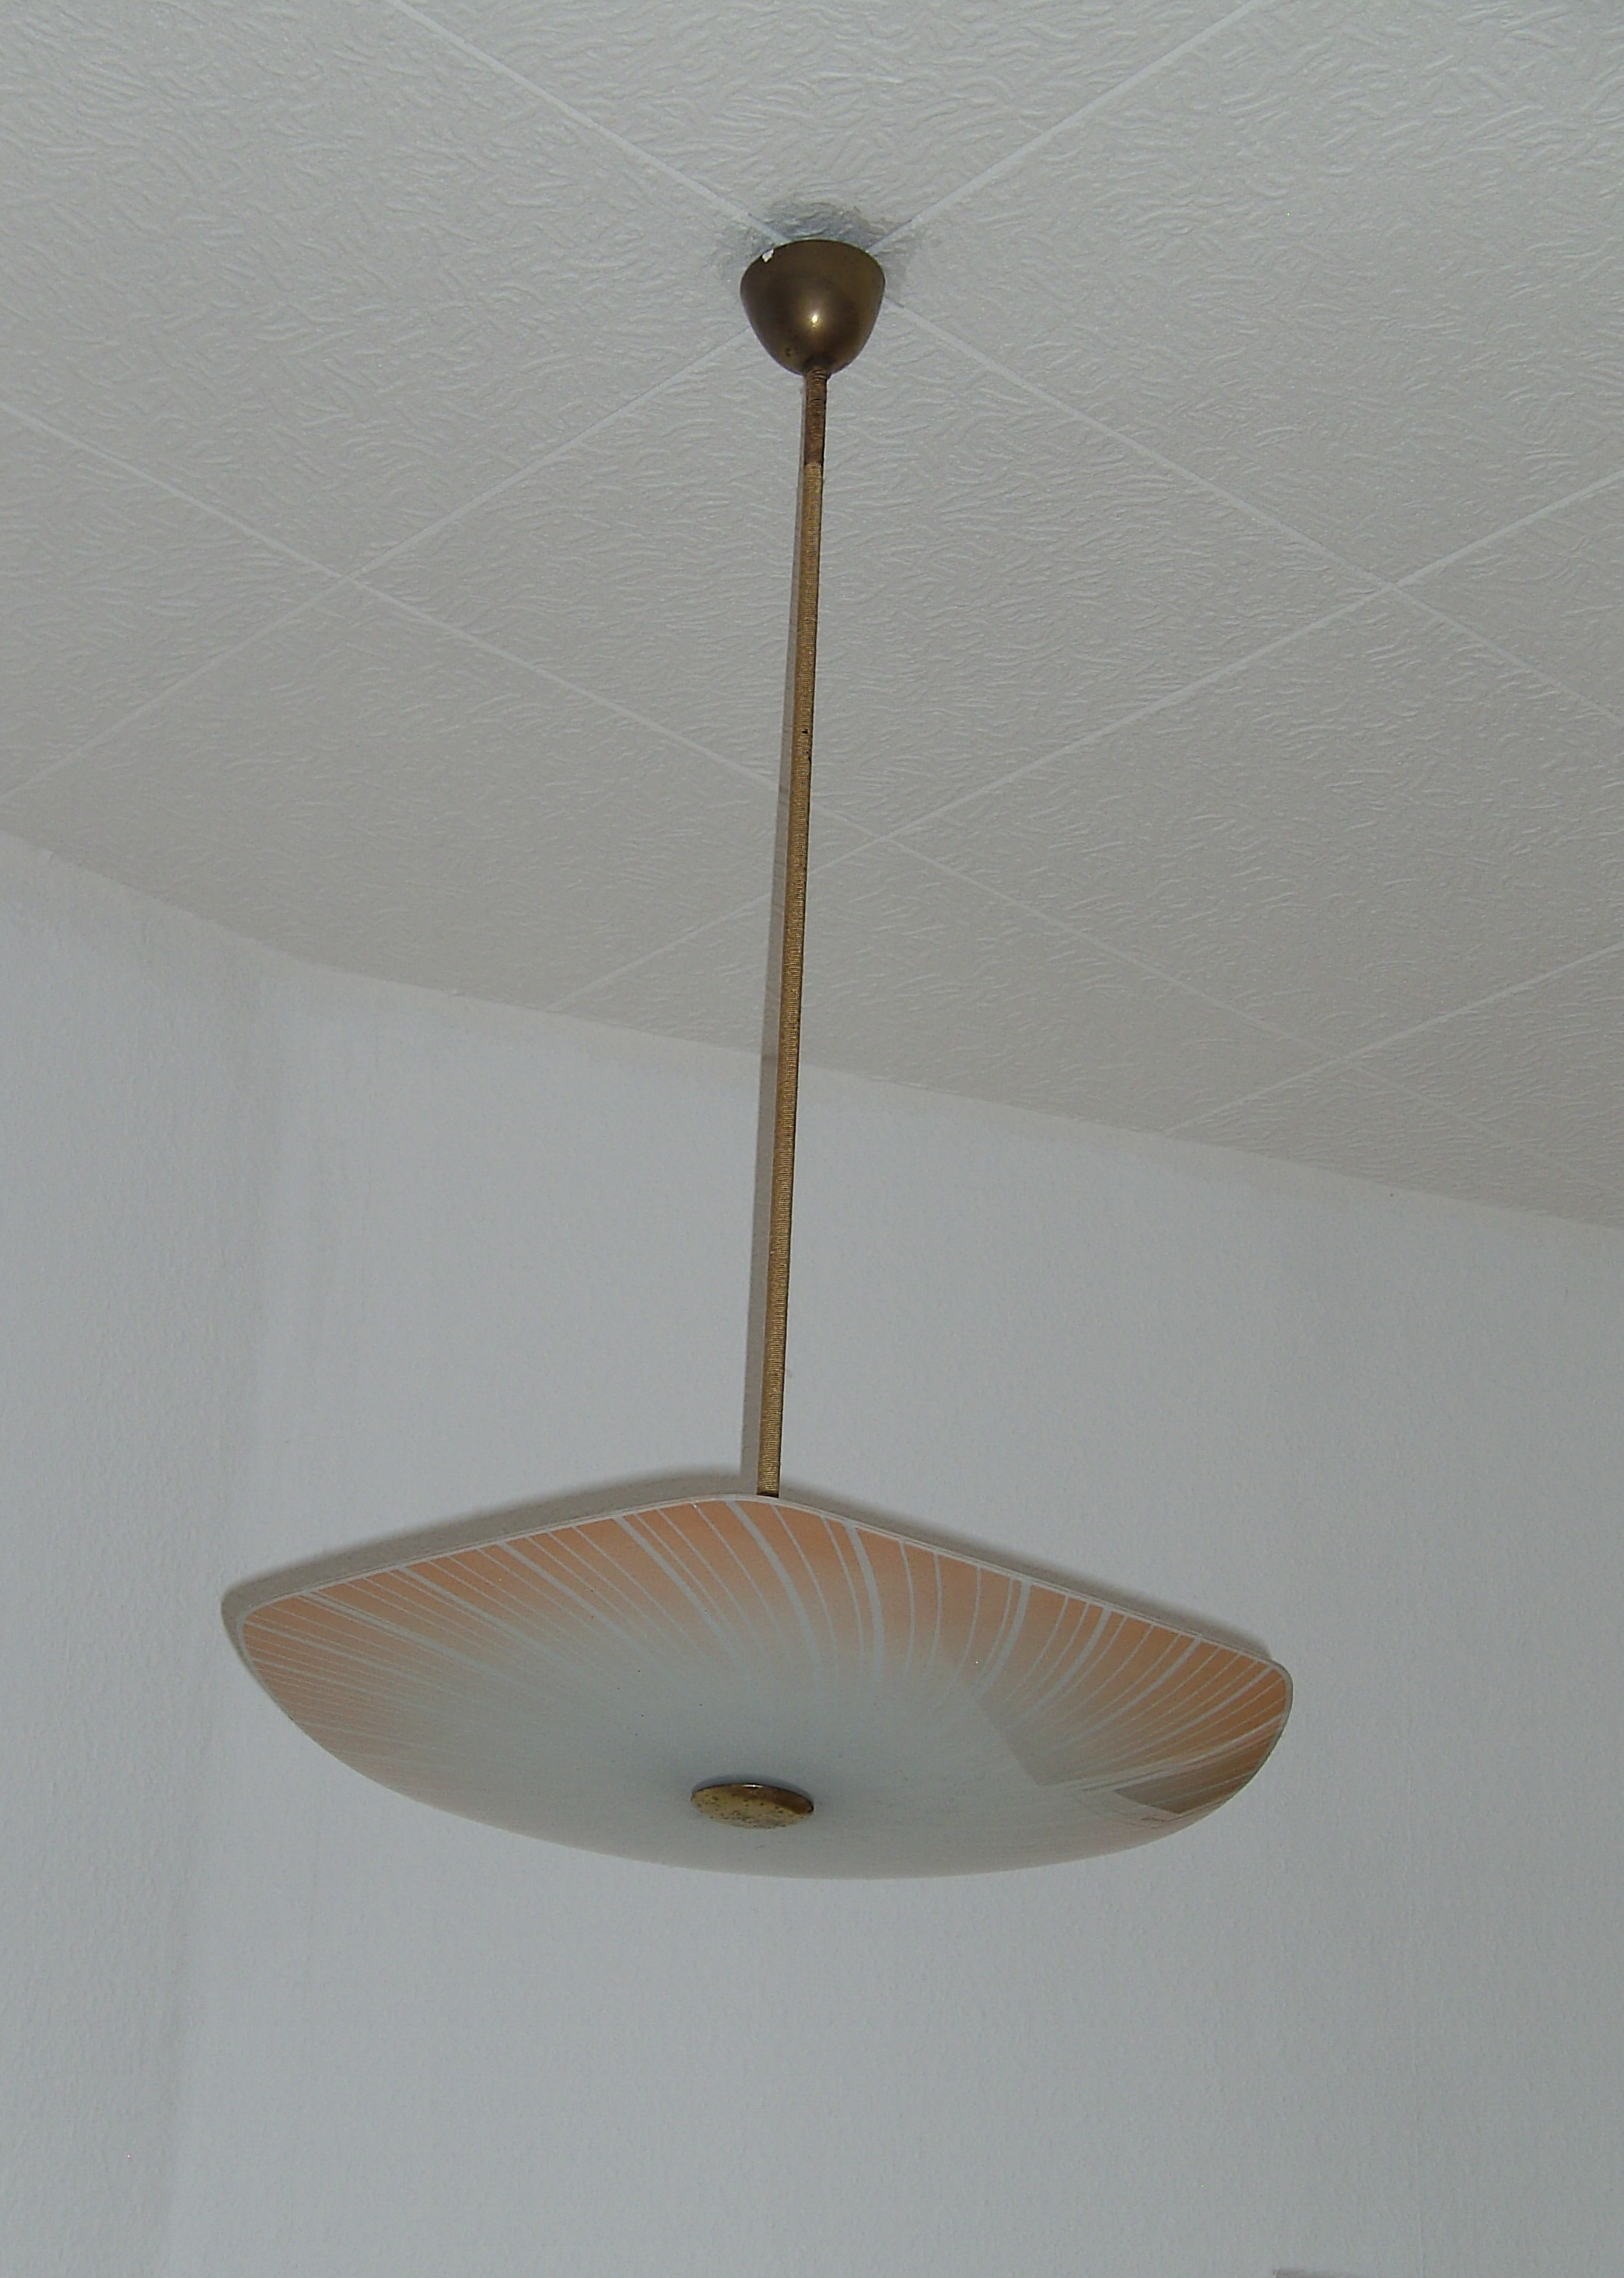 Retro Lampe, dekorativ, funktionsbereit,  VB